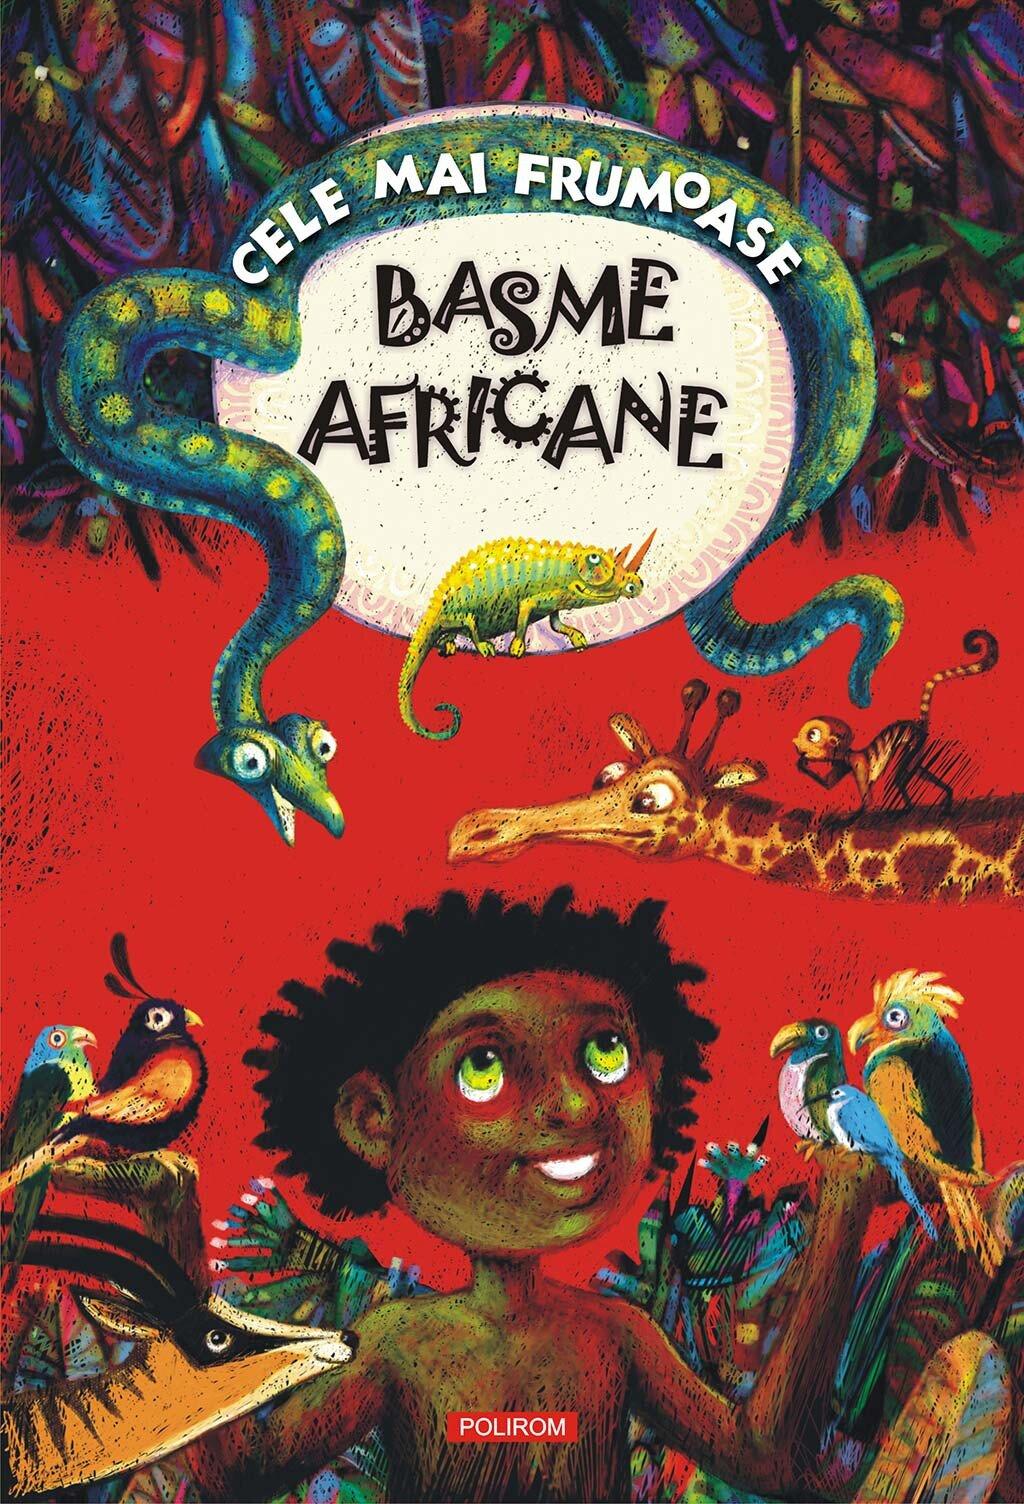 Cele mai frumoase basme africane PDF (Download eBook)